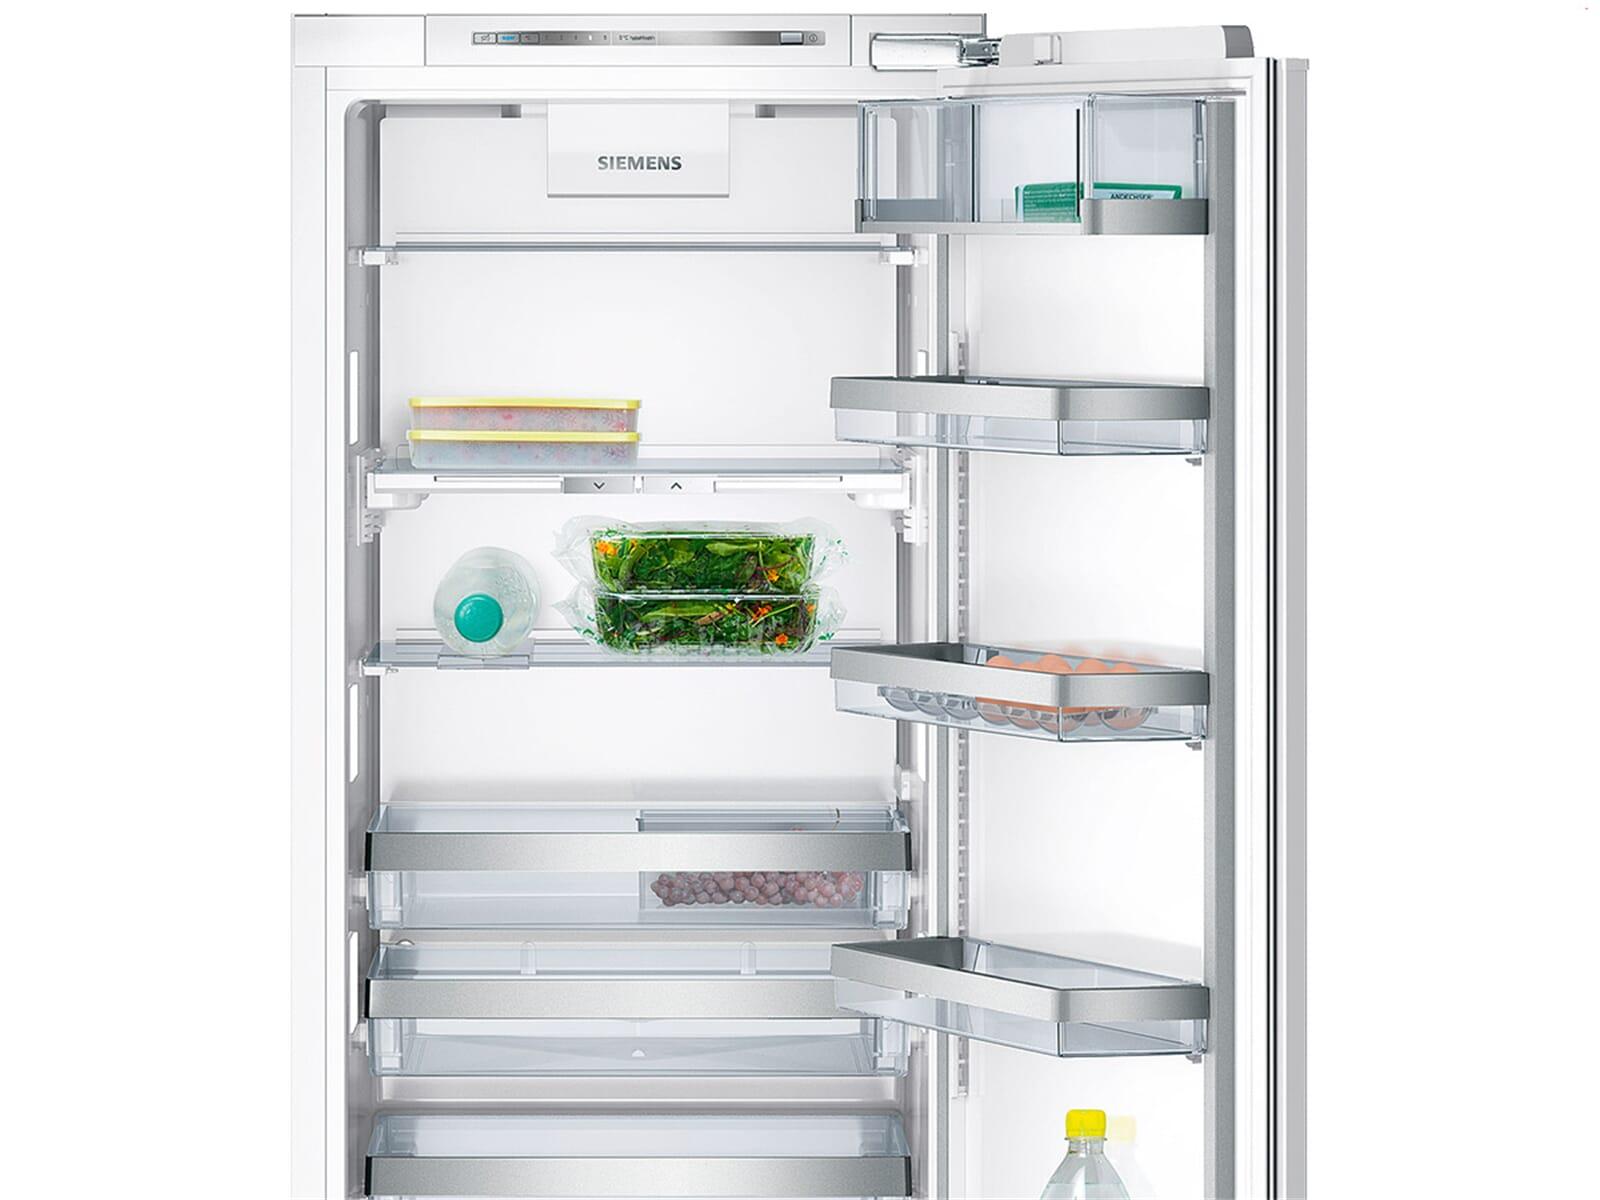 Siemens KI42FP60 Einbaukühlschrank